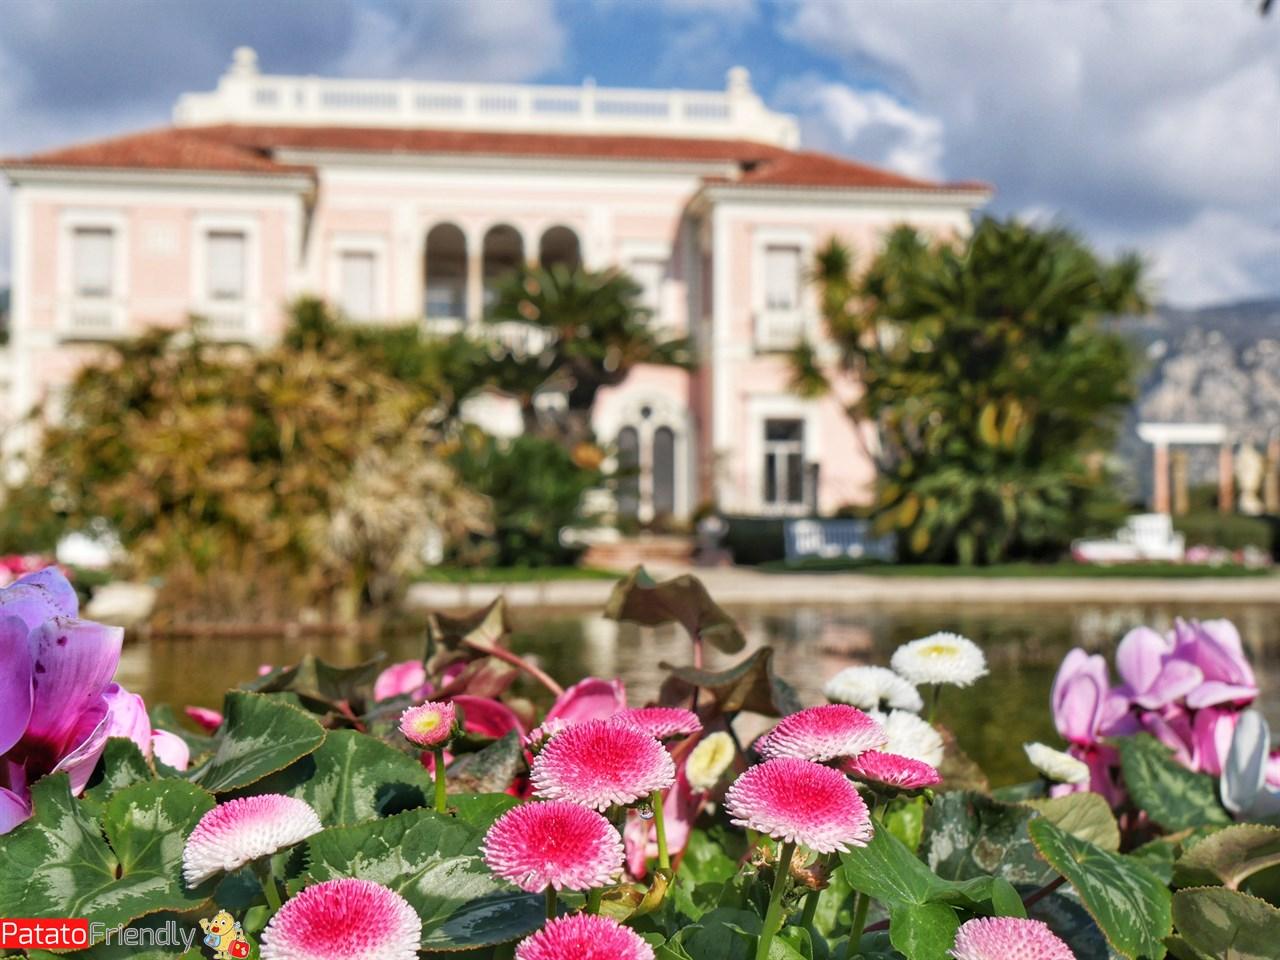 [cml_media_alt id='13698']Costa Azzurra in inverno - La Villa Ephrussi de Rothschild[/cml_media_alt]